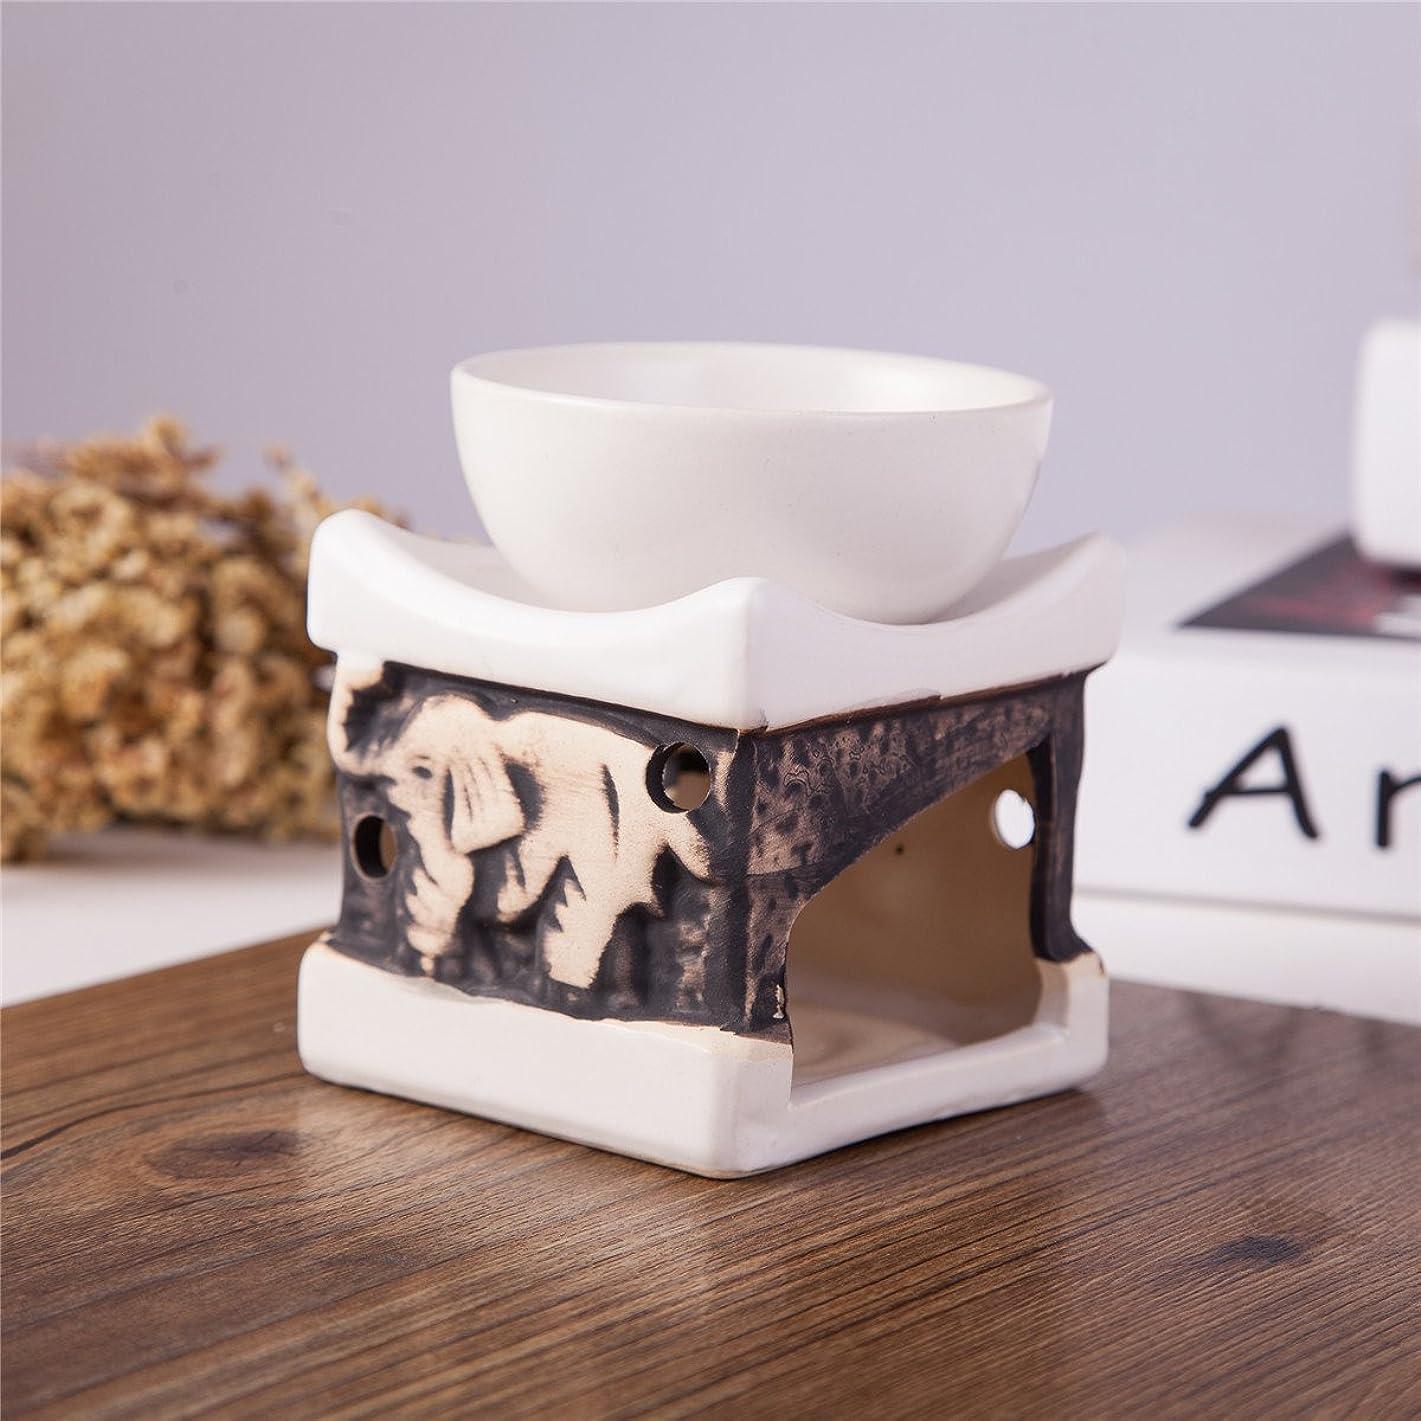 Feng Shui Zen Ceramic Essential Oil Burner Diffuser Tea Light Holder Great For Home Decoration & Aromatherapy OLBA097